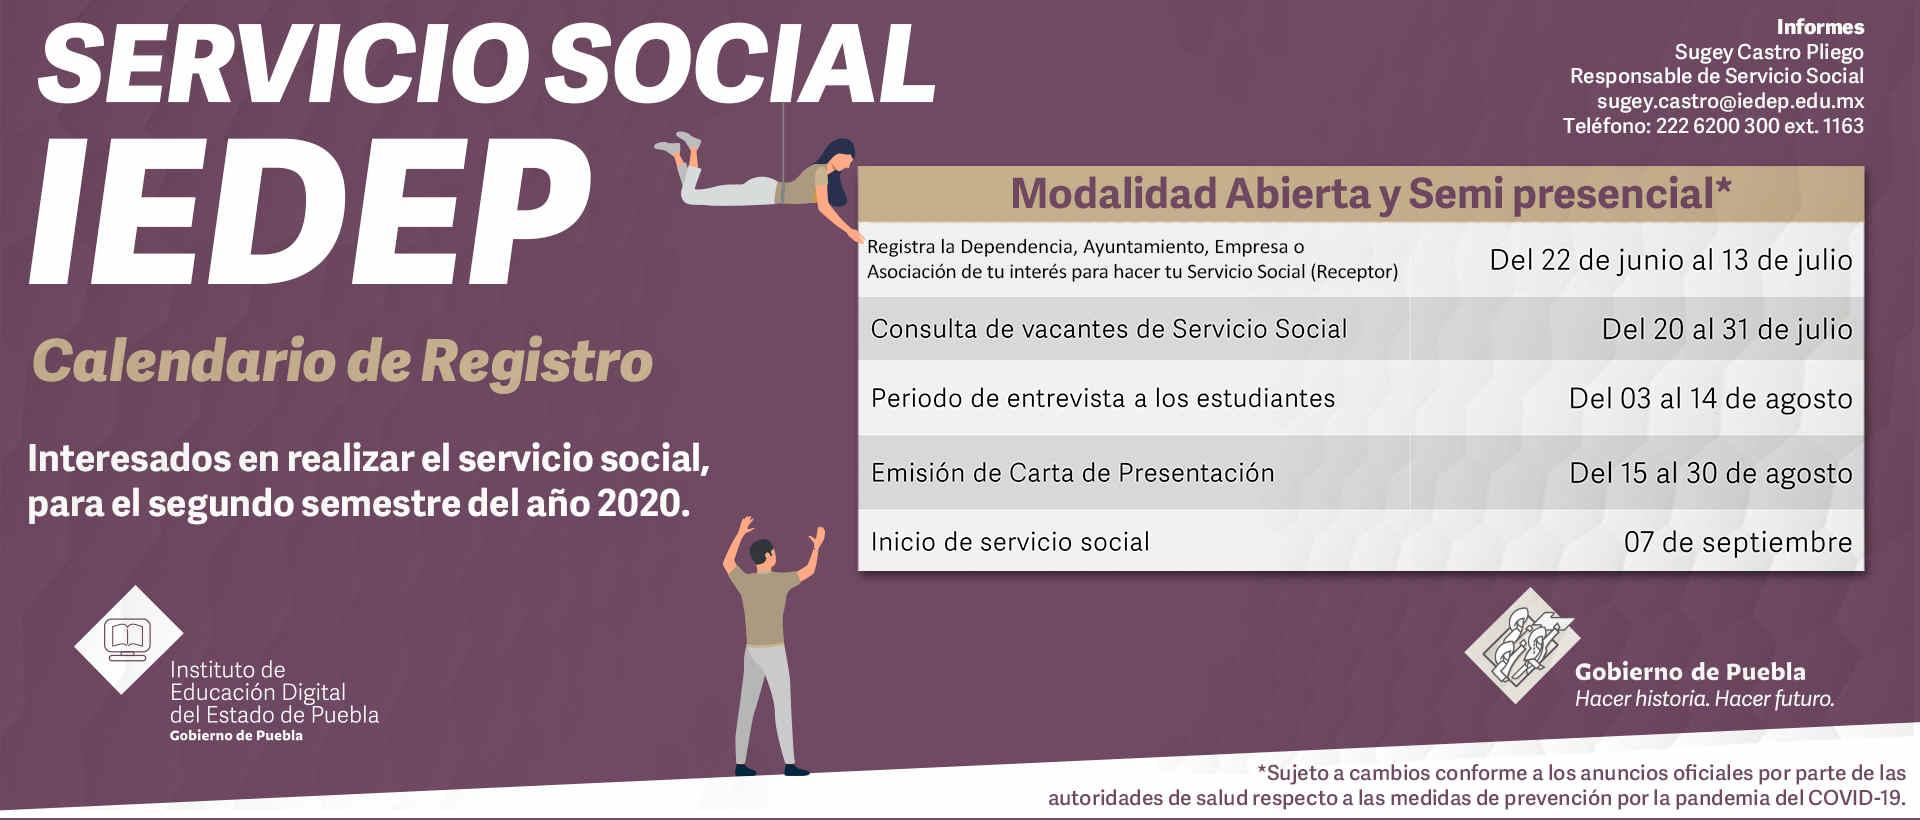 servicio_social.jpg